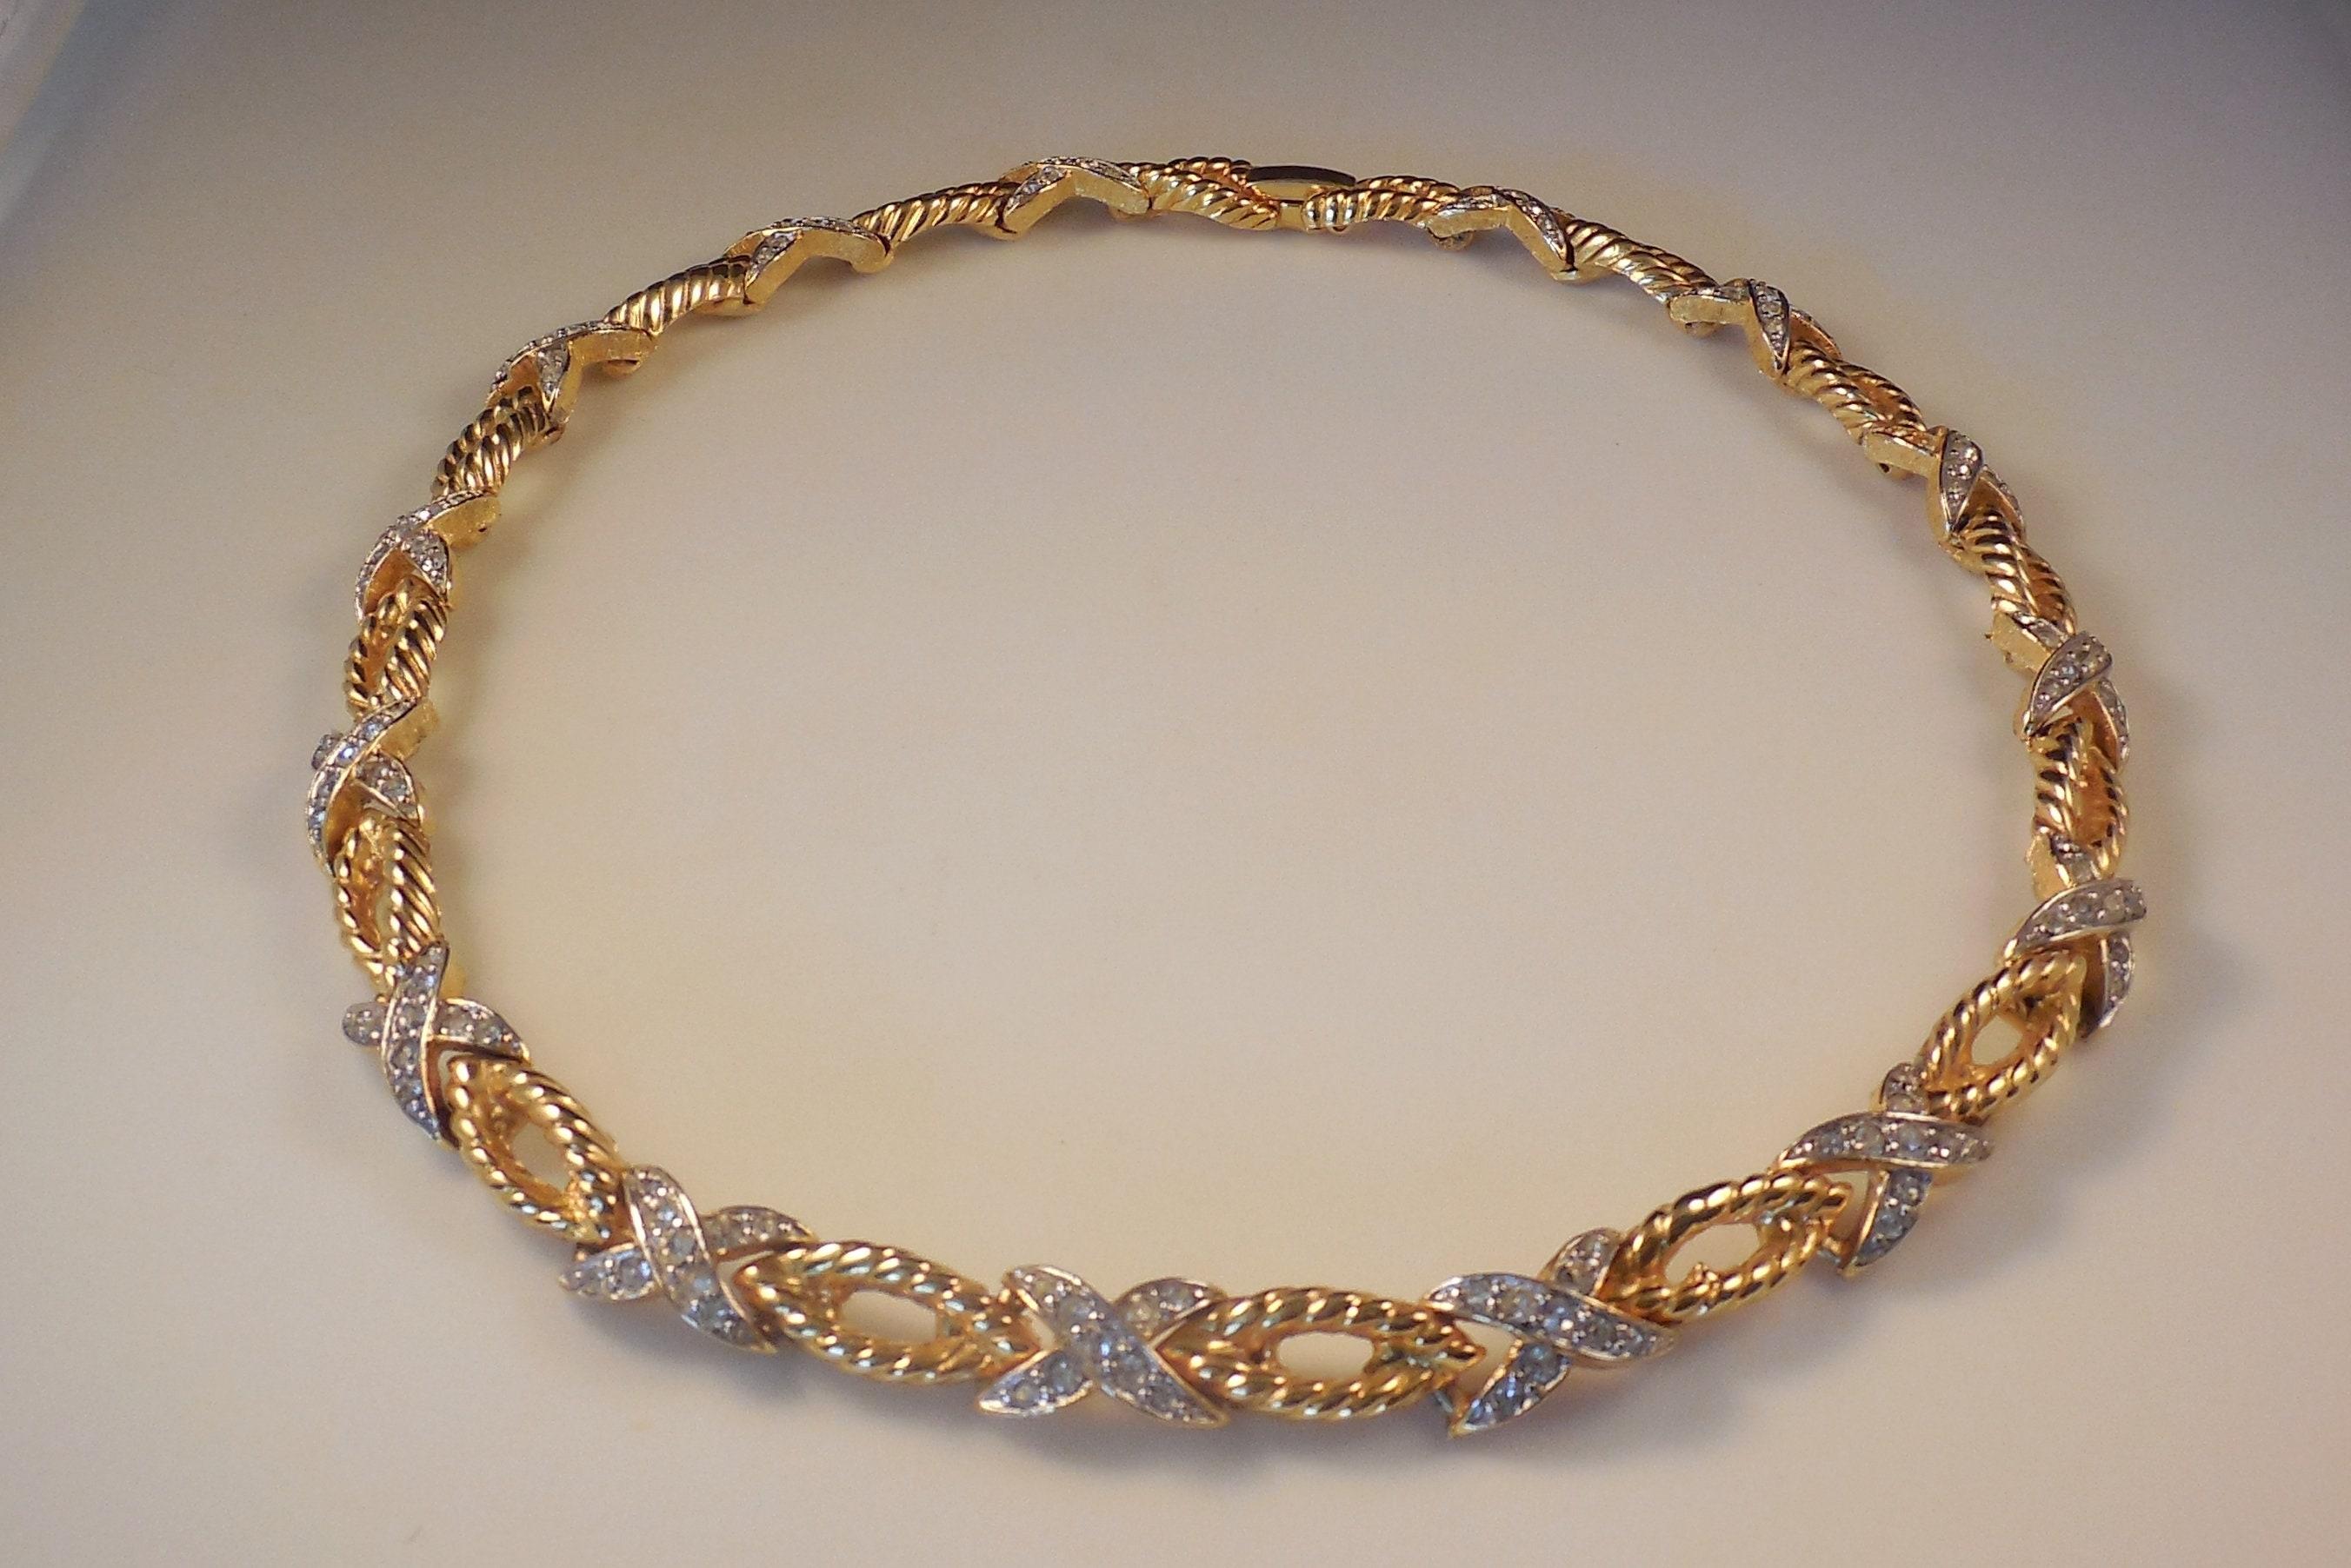 Vintage Jomaz X/'s and O/'s Crystal Rhinestone Choker Necklace Gold Tone